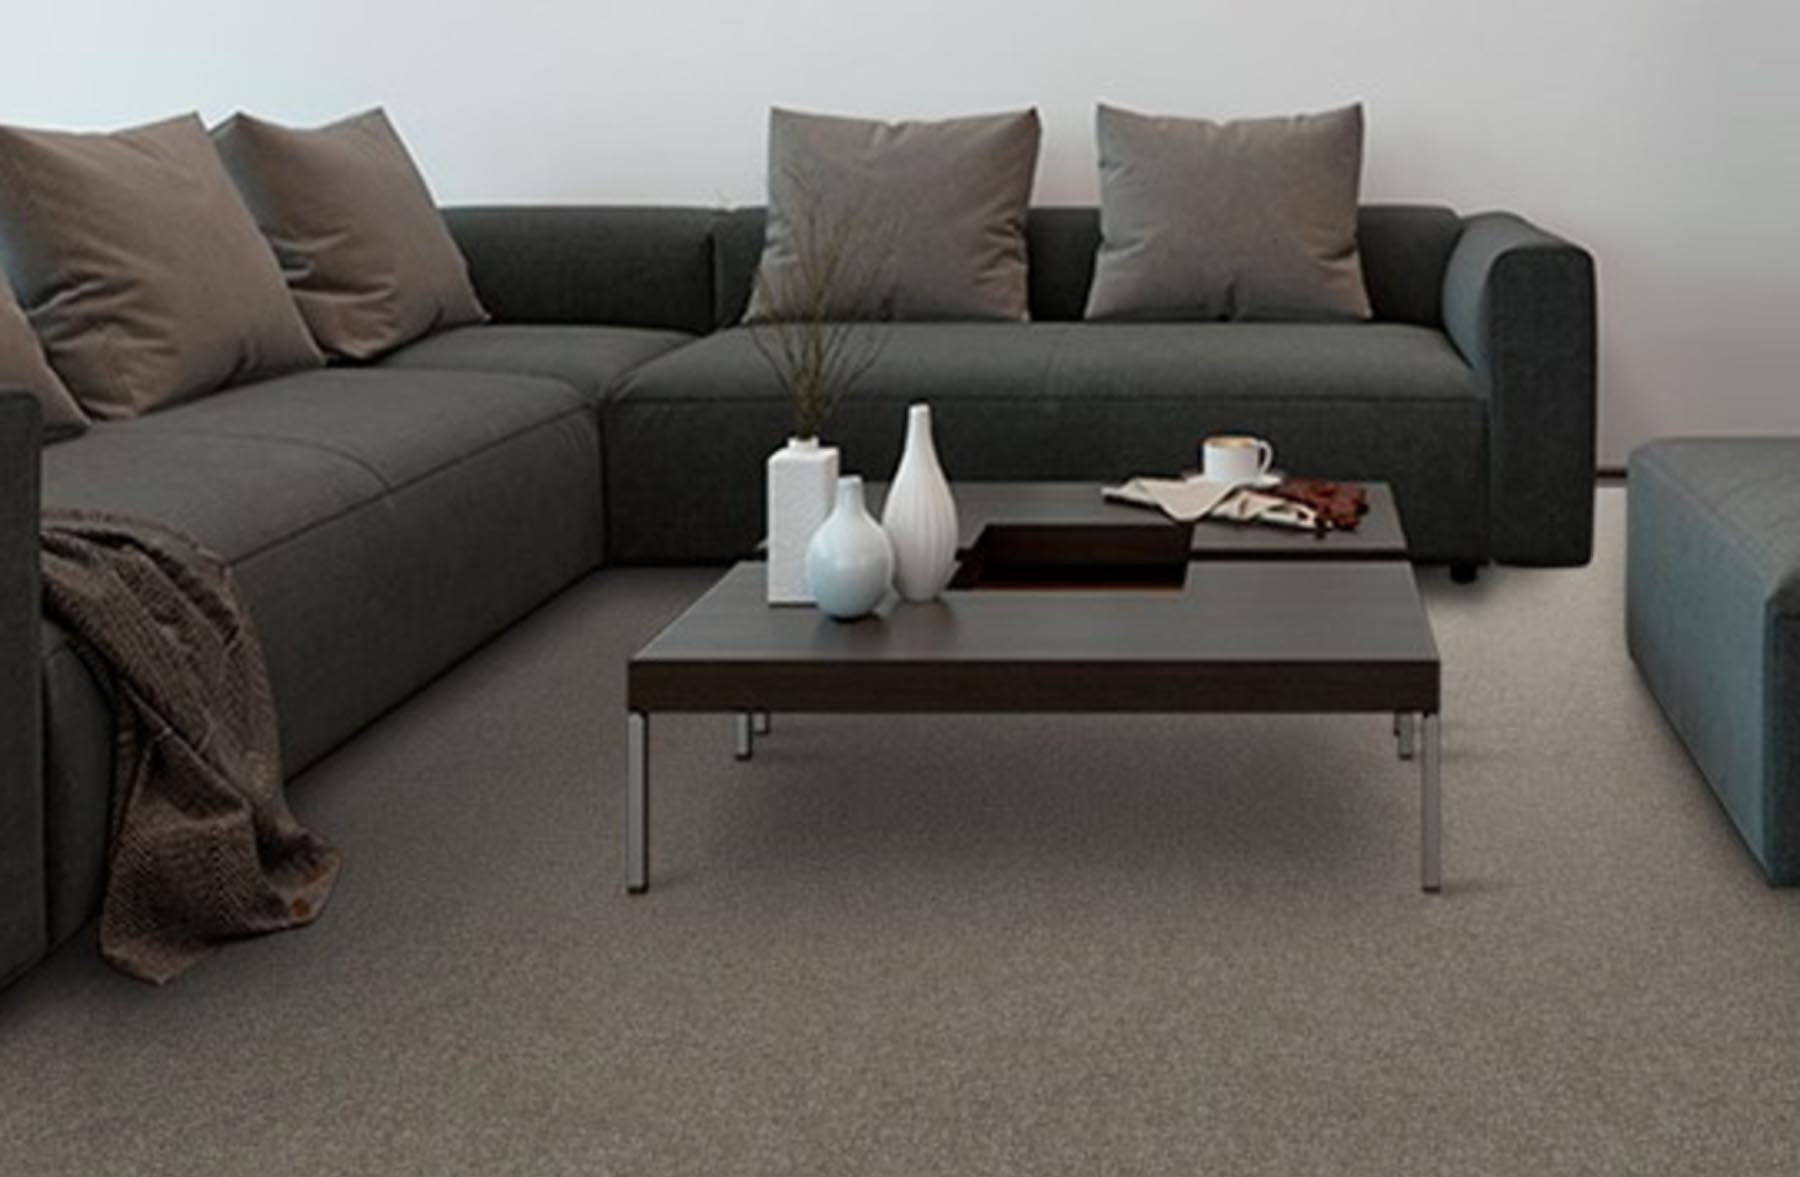 carpet-decor_scenes-jewel_brown-floor-fowlers-carpets